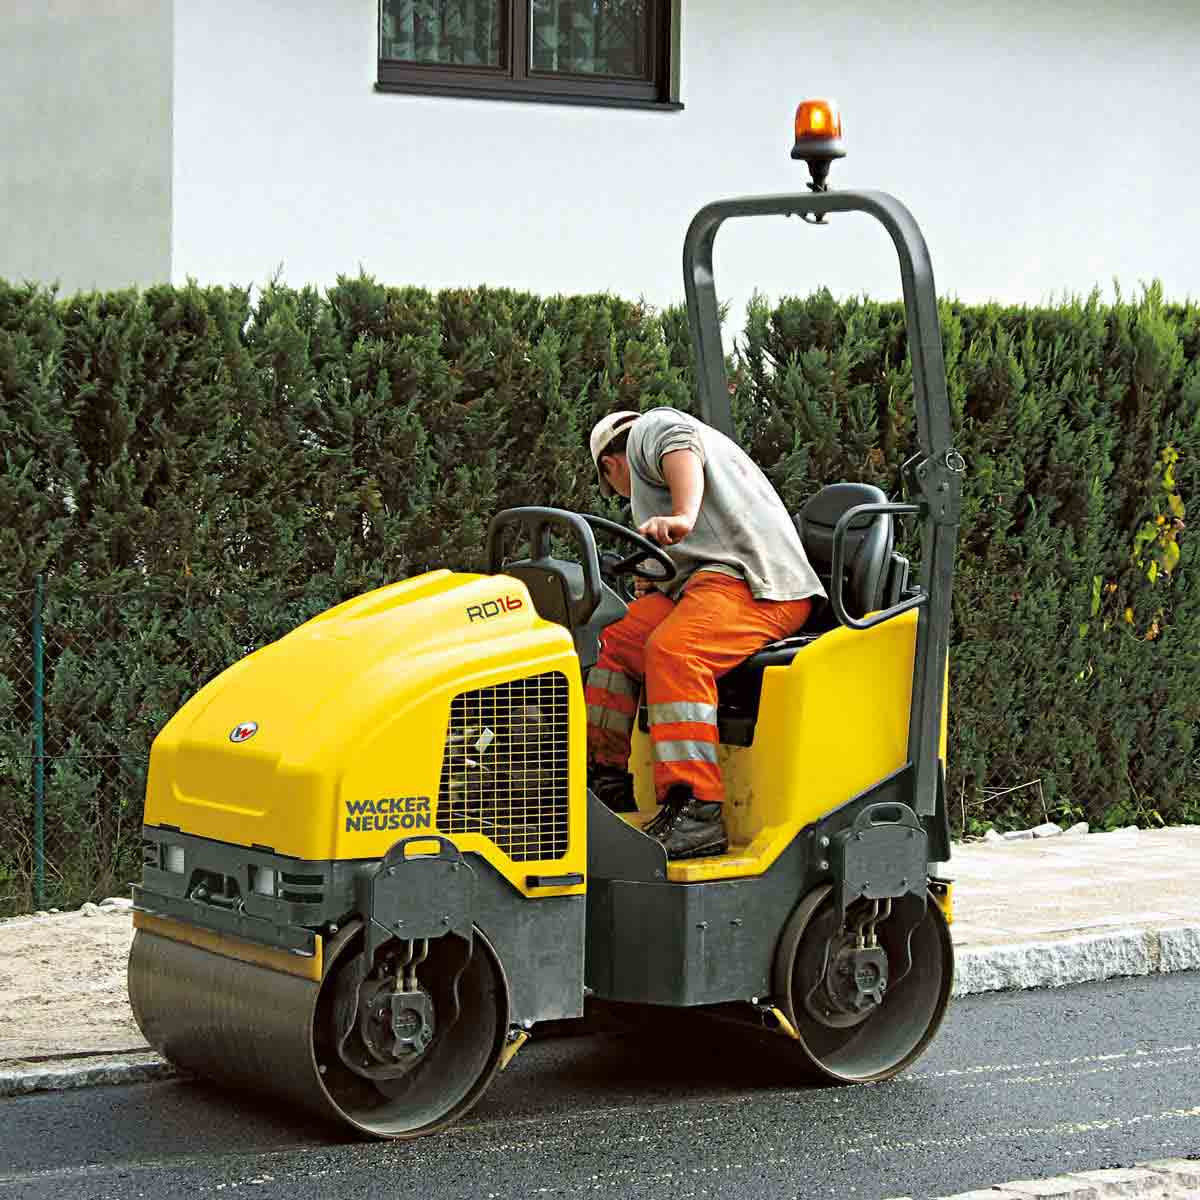 Wacker Neuson roller street work